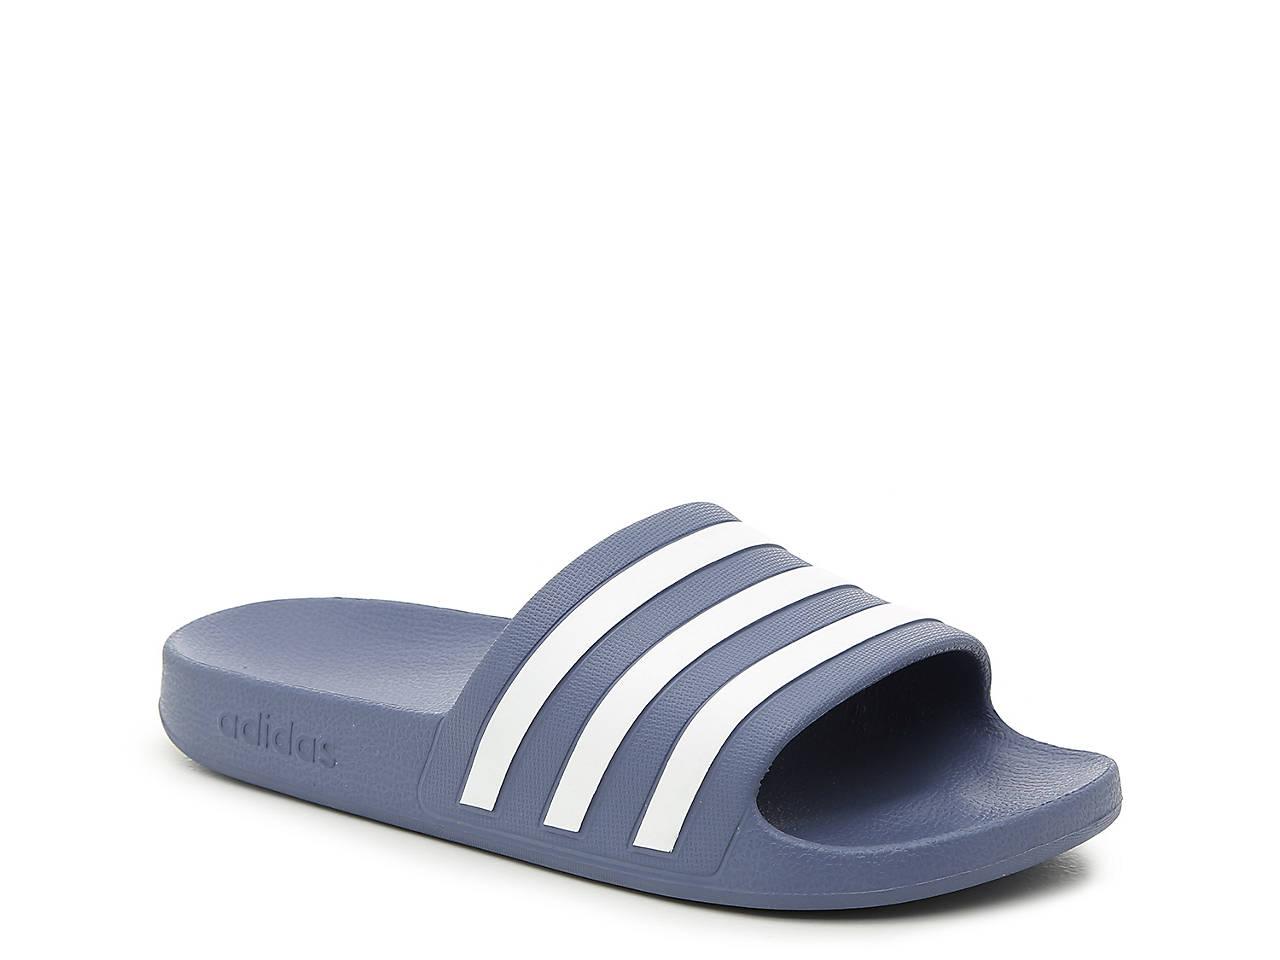 9e26f754e9f adidas Adilette Aqua Slide Sandal - Women's Women's Shoes | DSW